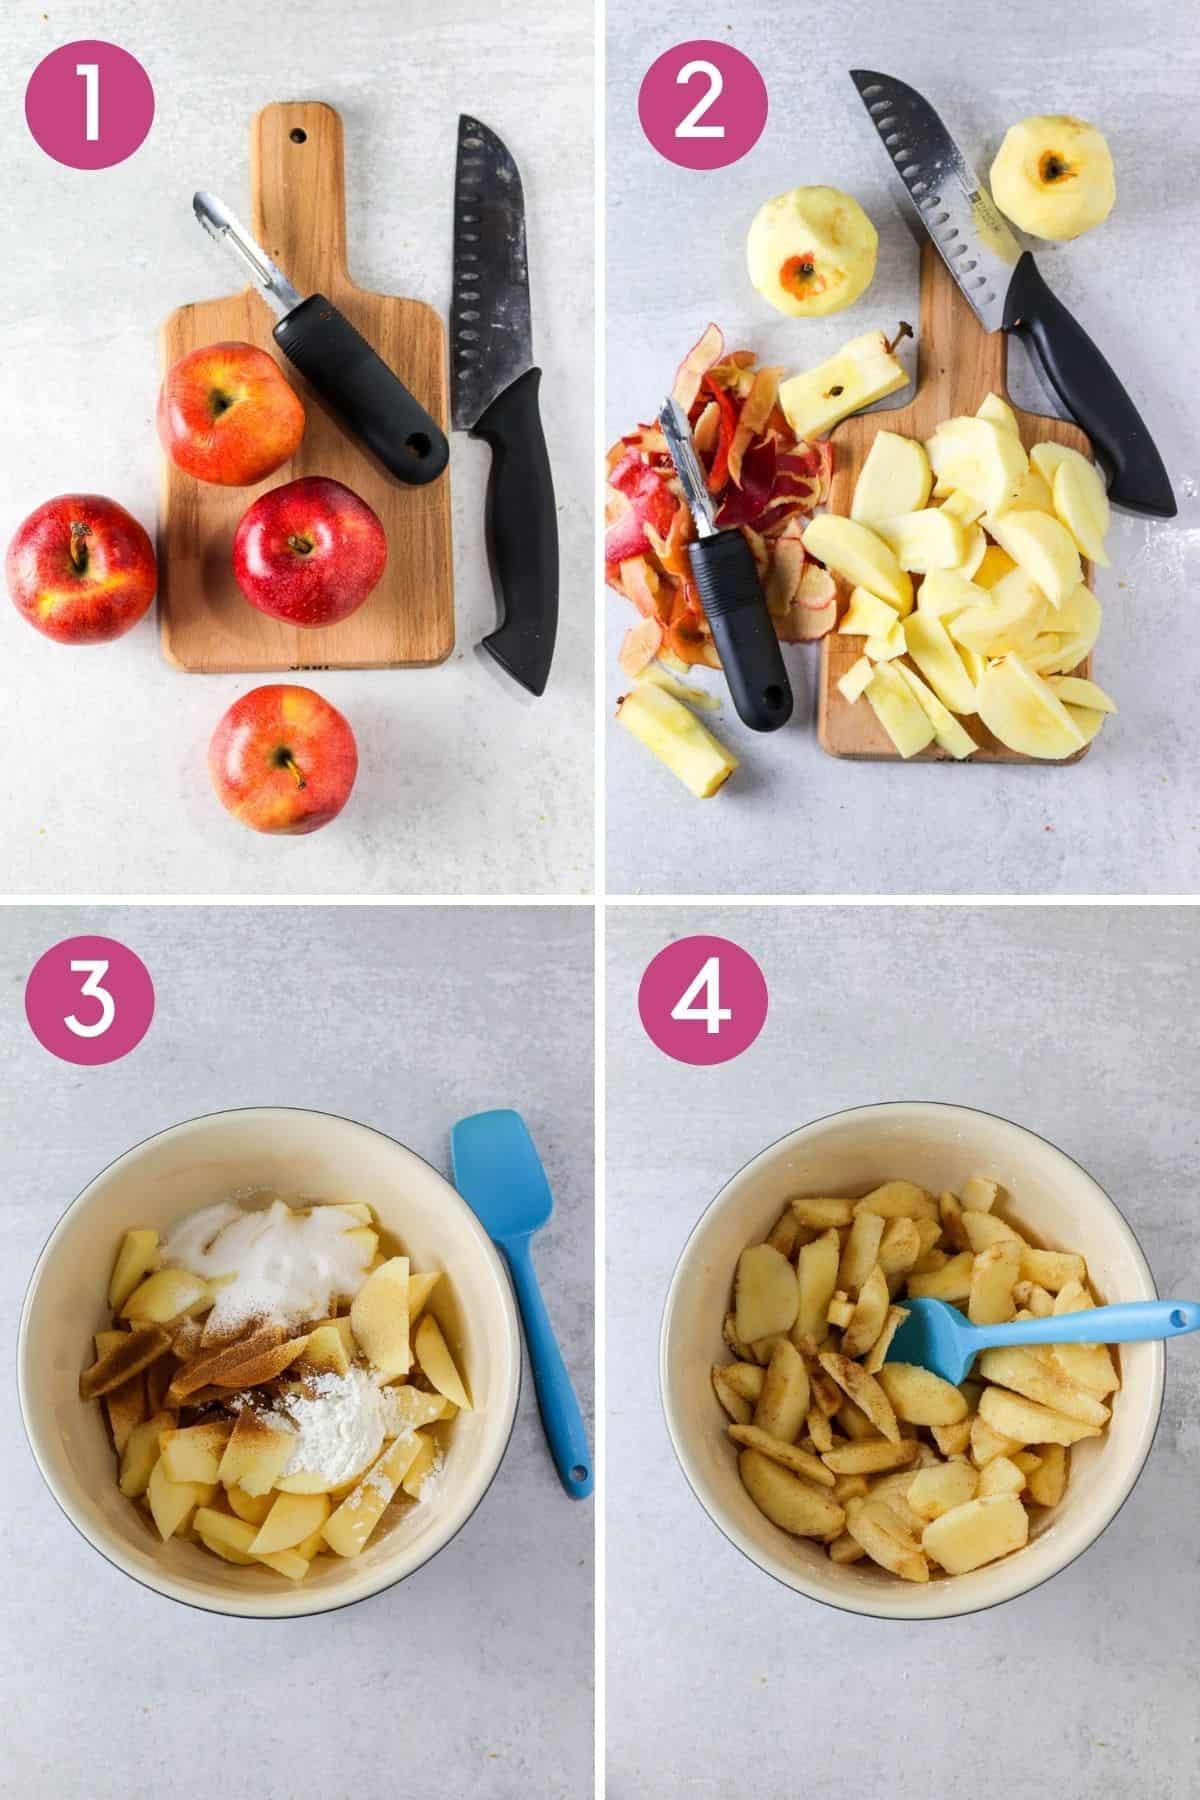 How to prepare apples to make a skillet apple crisp.